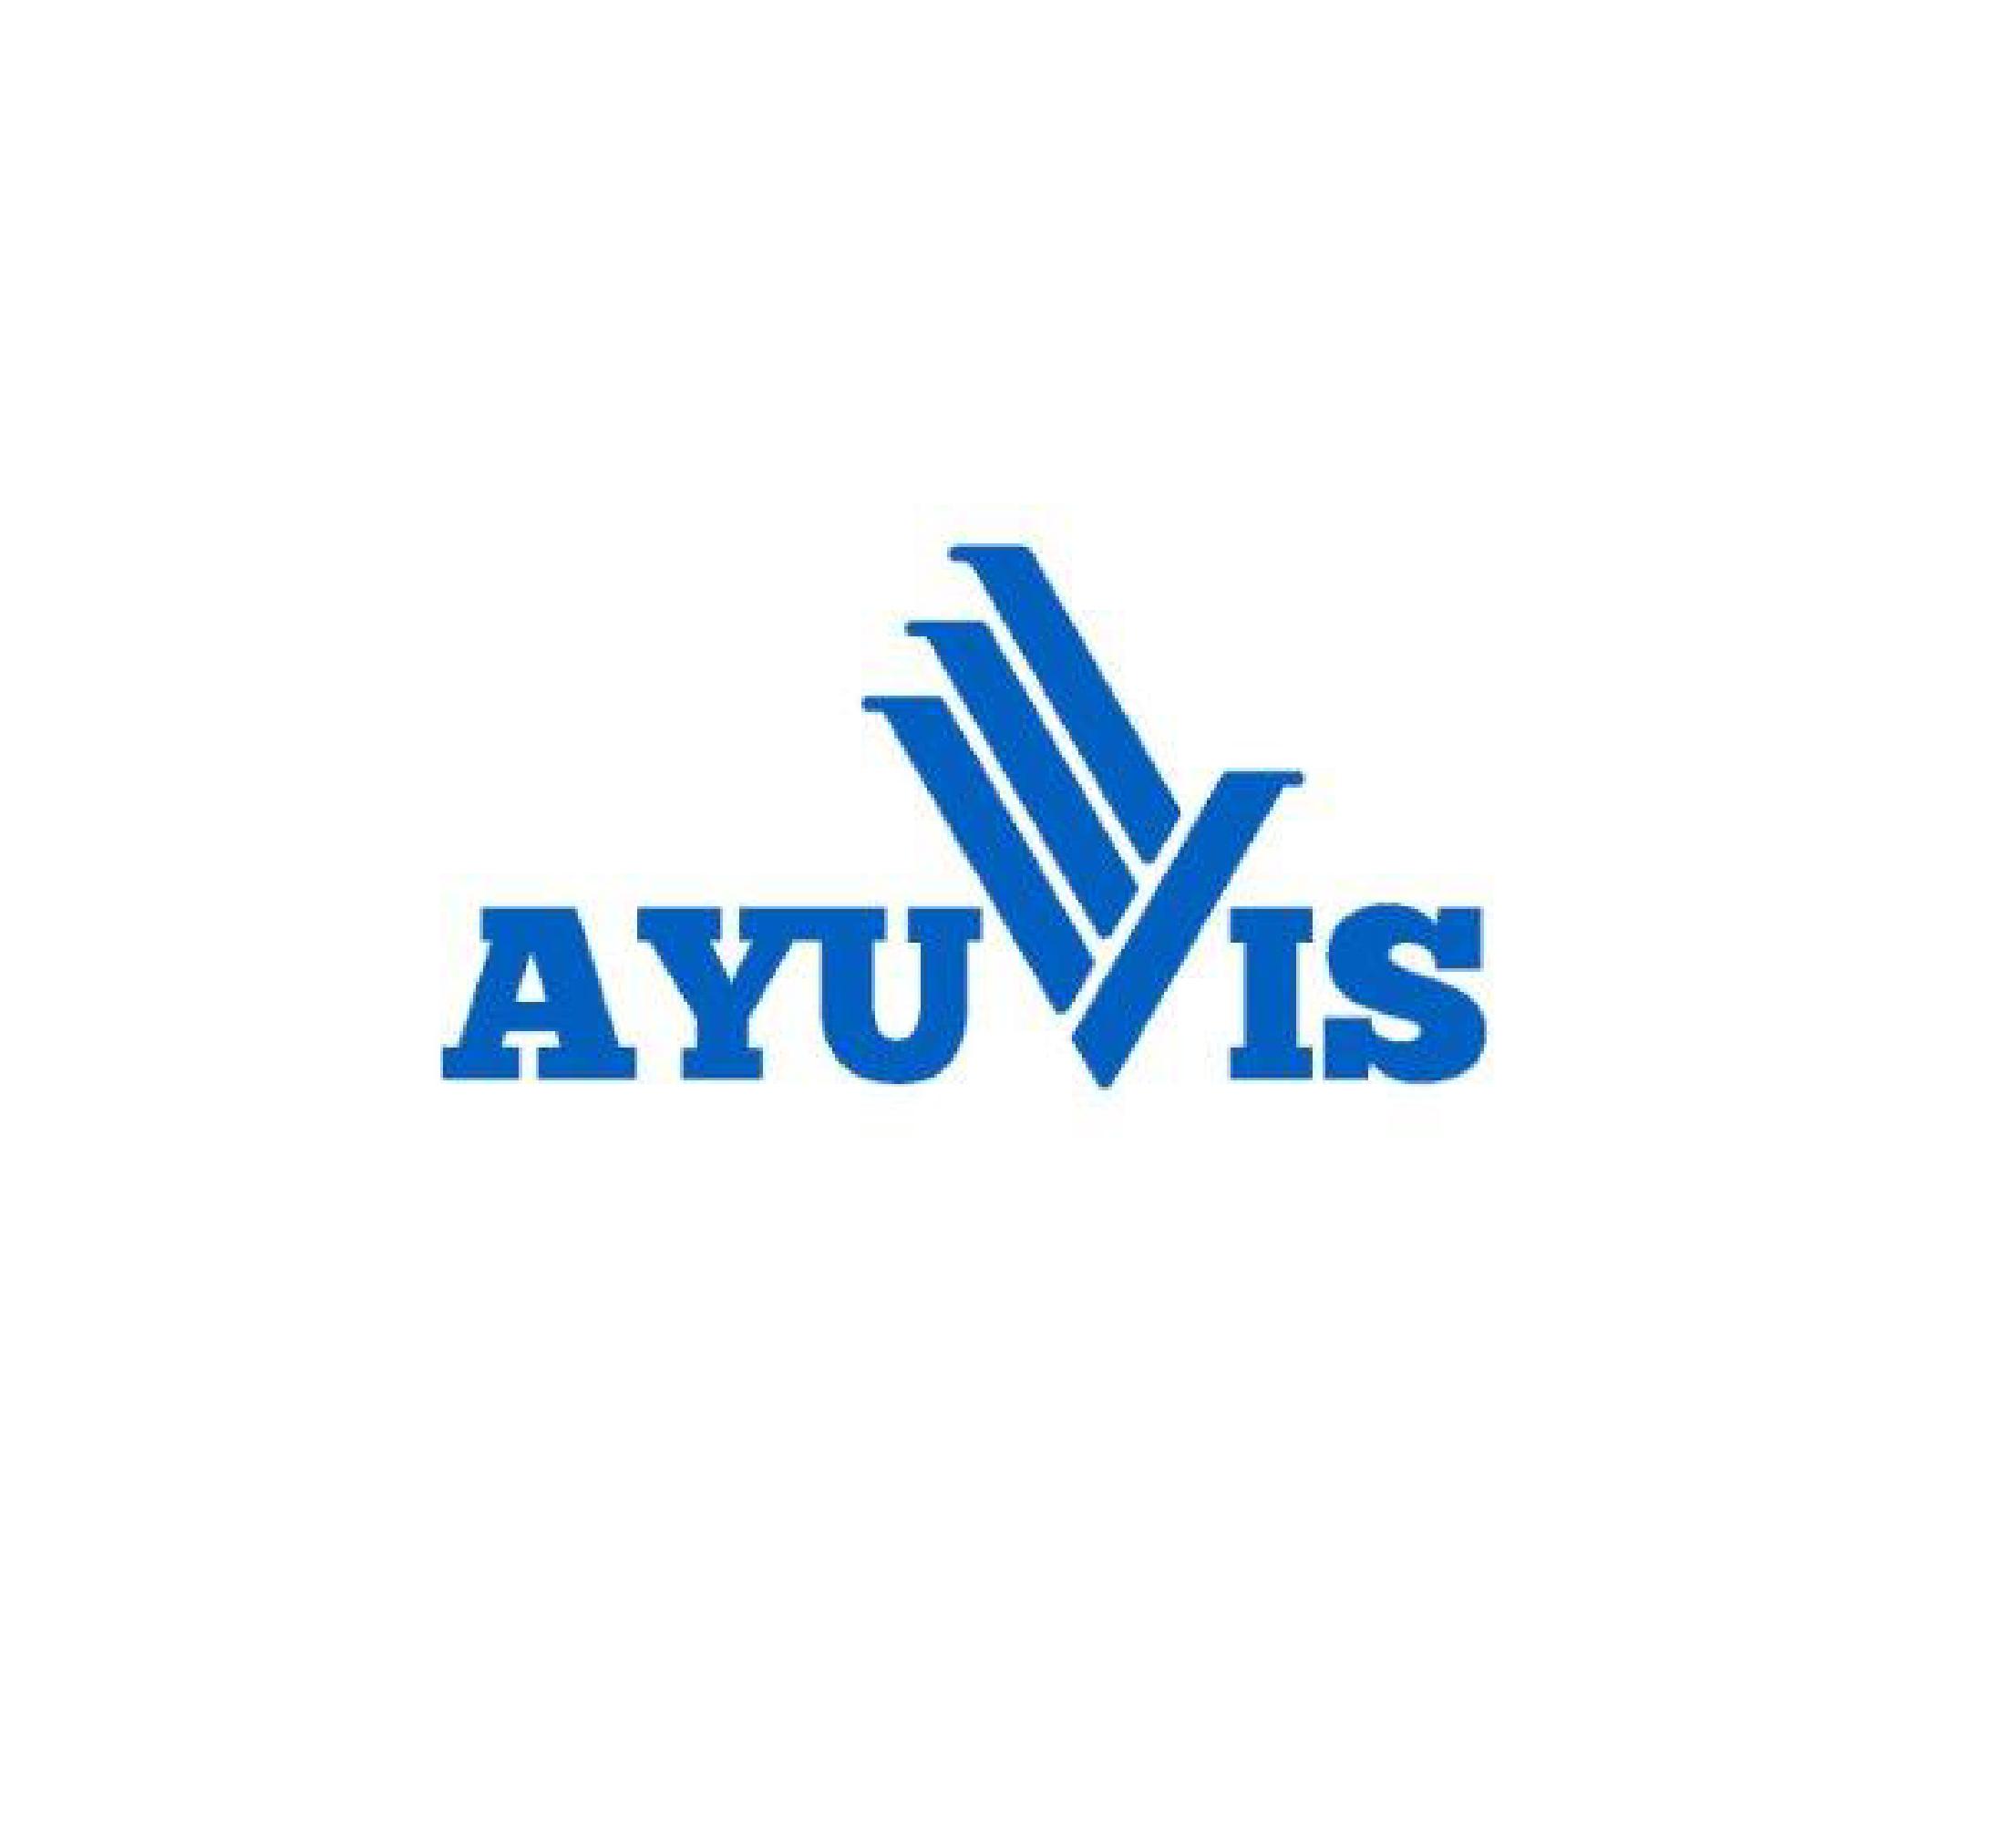 ayuviswebready.png